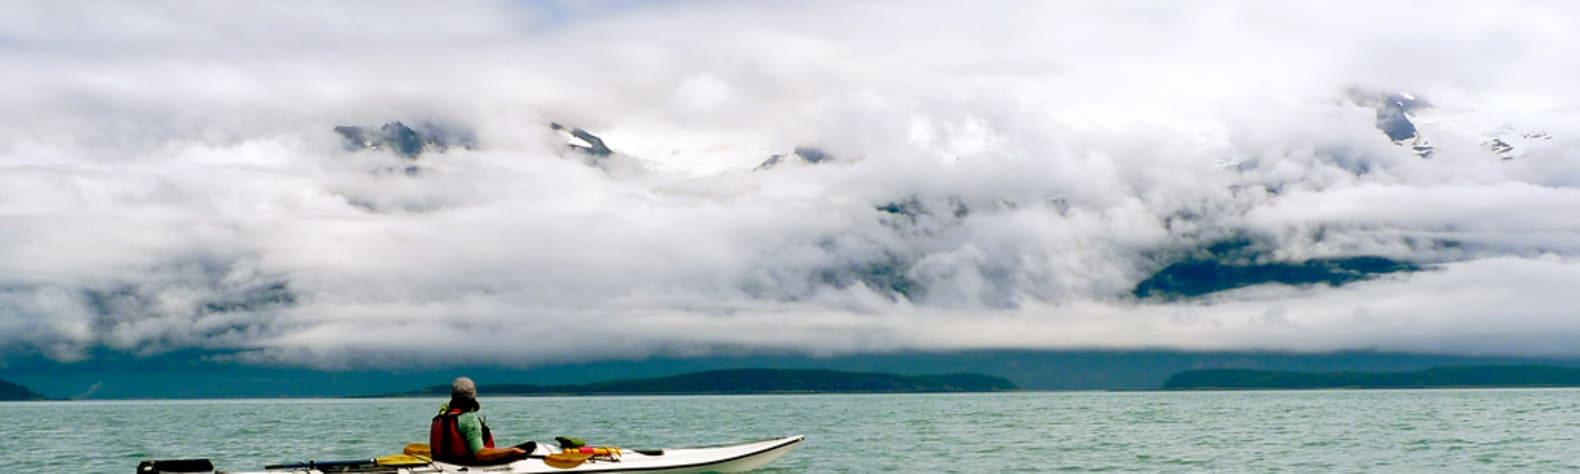 Chilkat Islands State Marine Park